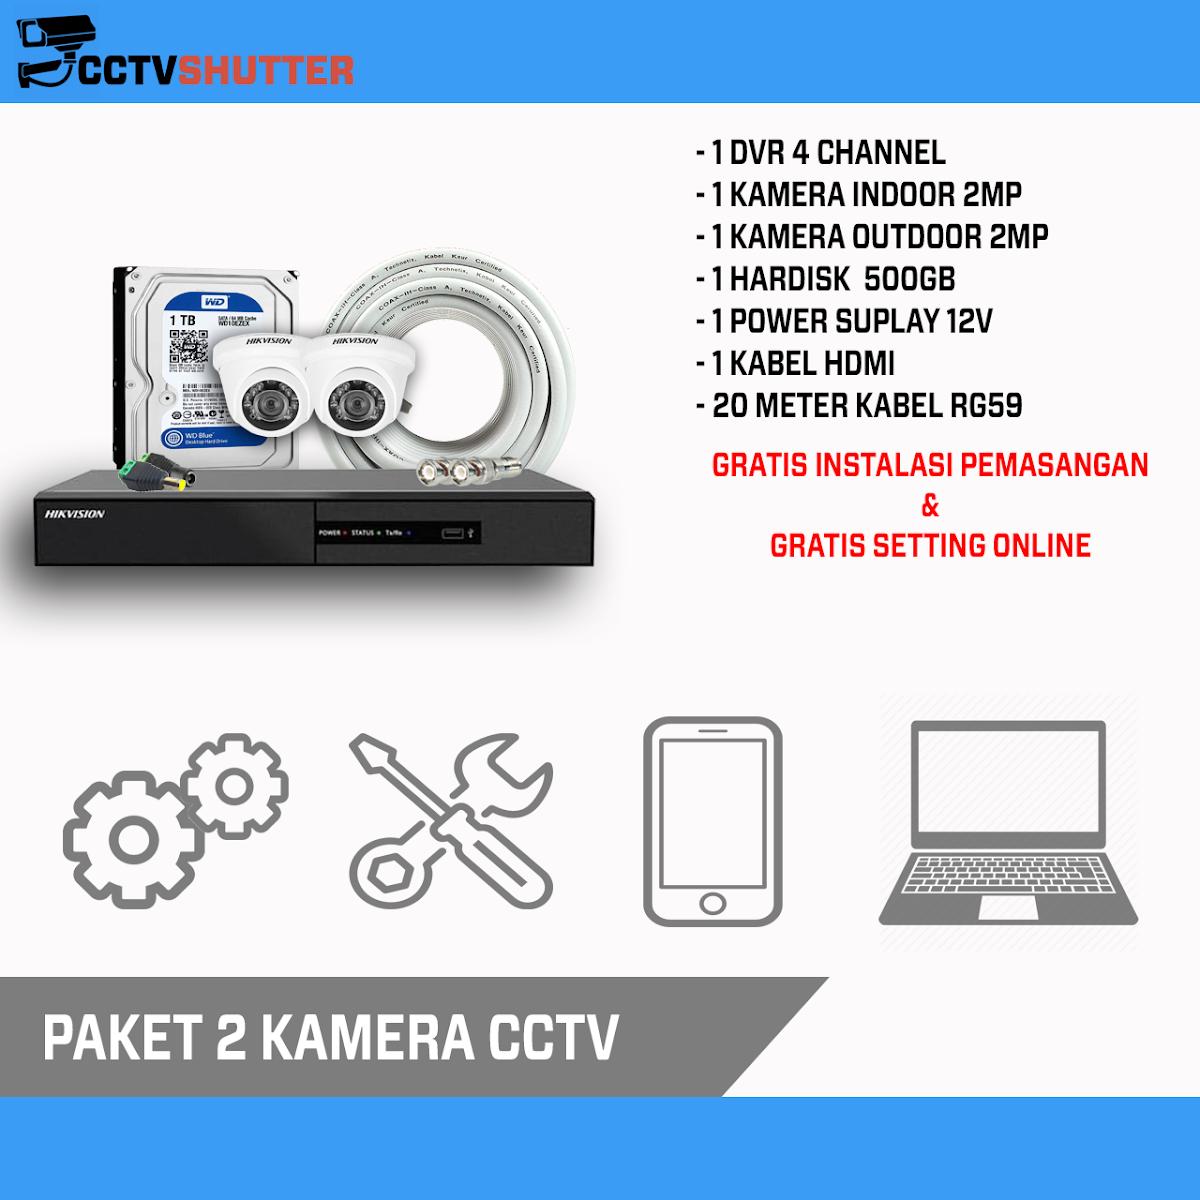 PASANG 16 KAMERA 2MP CCTV ONLINE MURAH